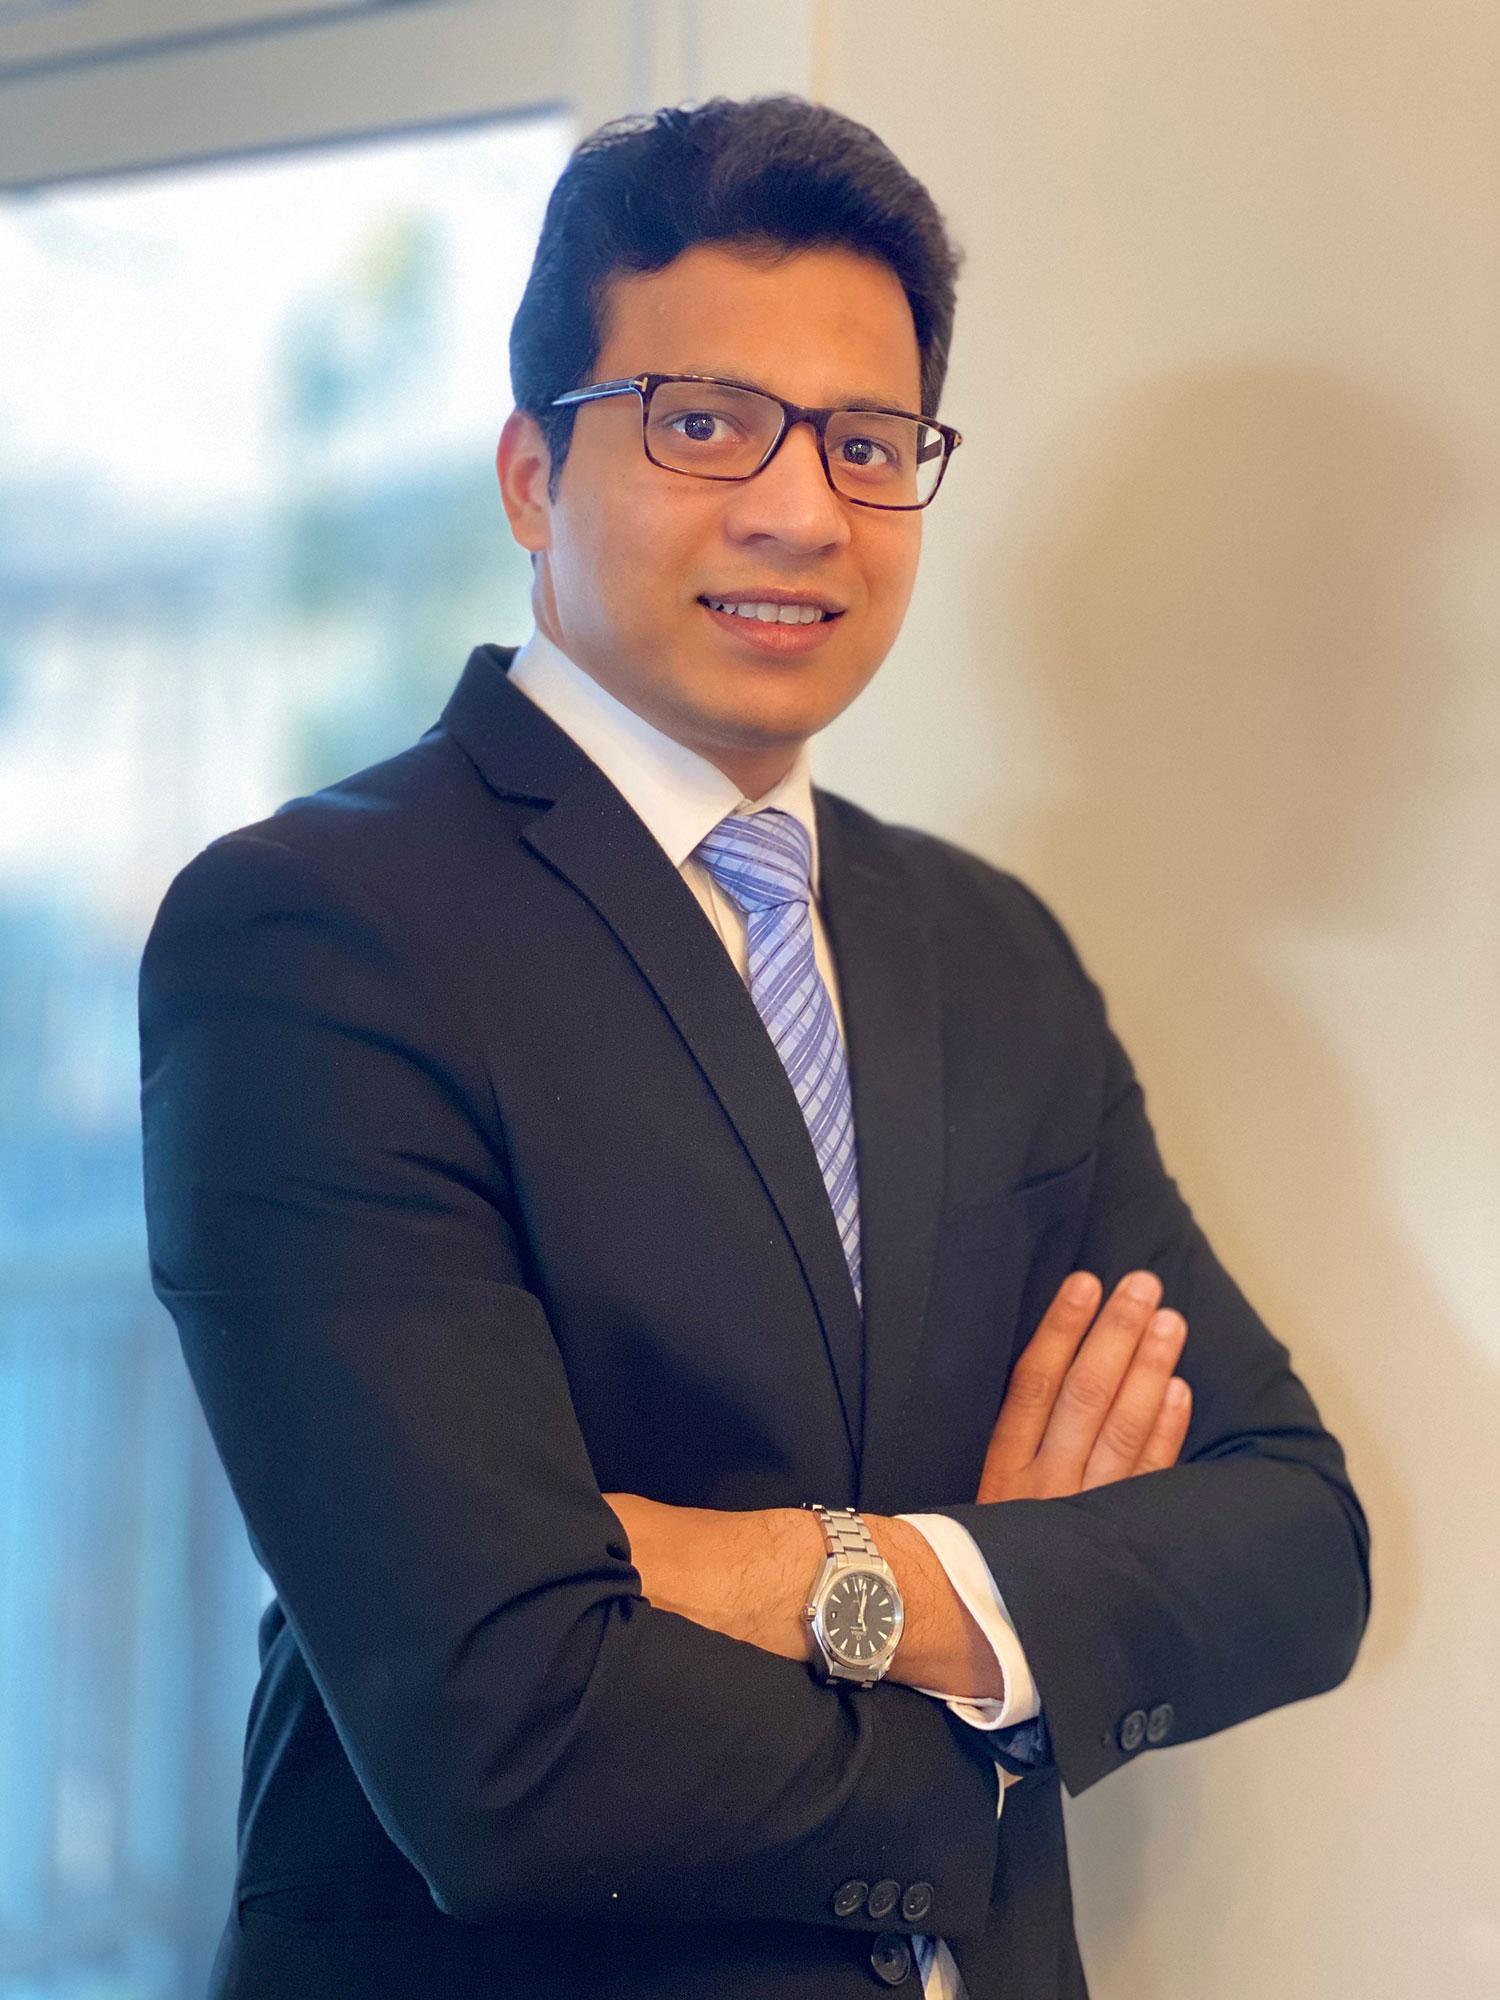 Atkinson Law - Saurabh Singhal